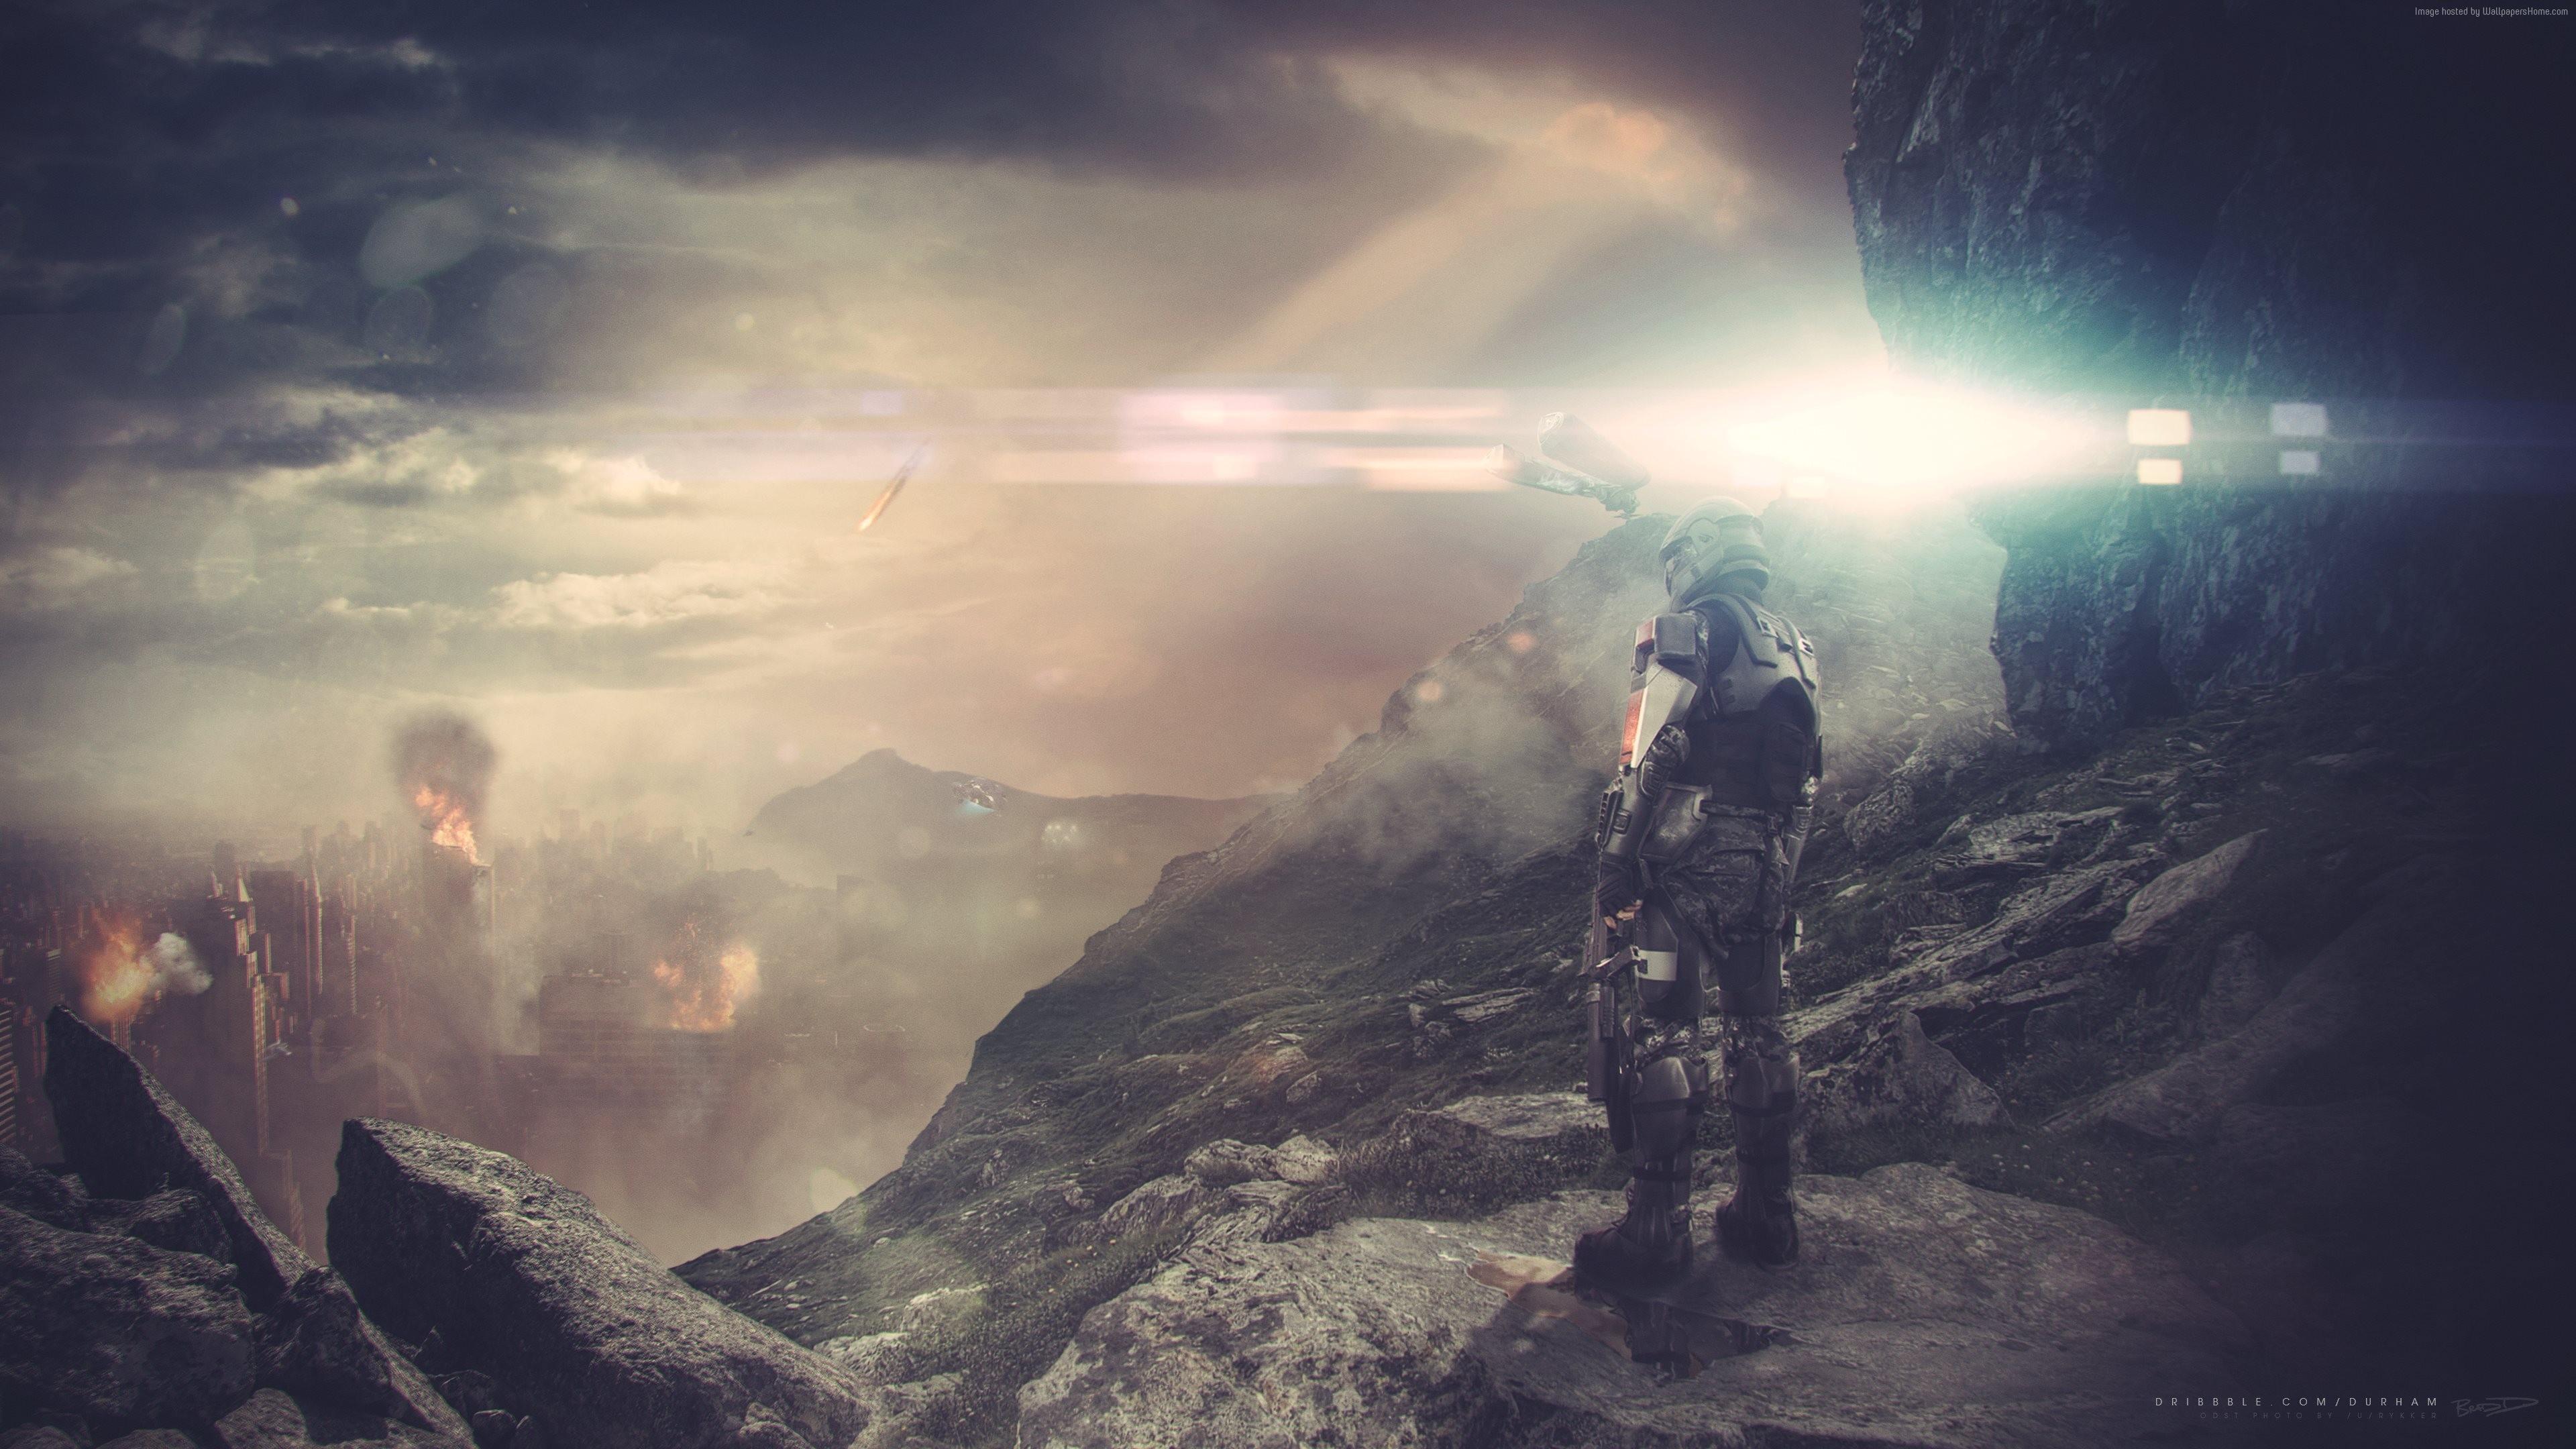 Halo 5: Guardians, 4k, HD wallpaper, game, fps, sci- …